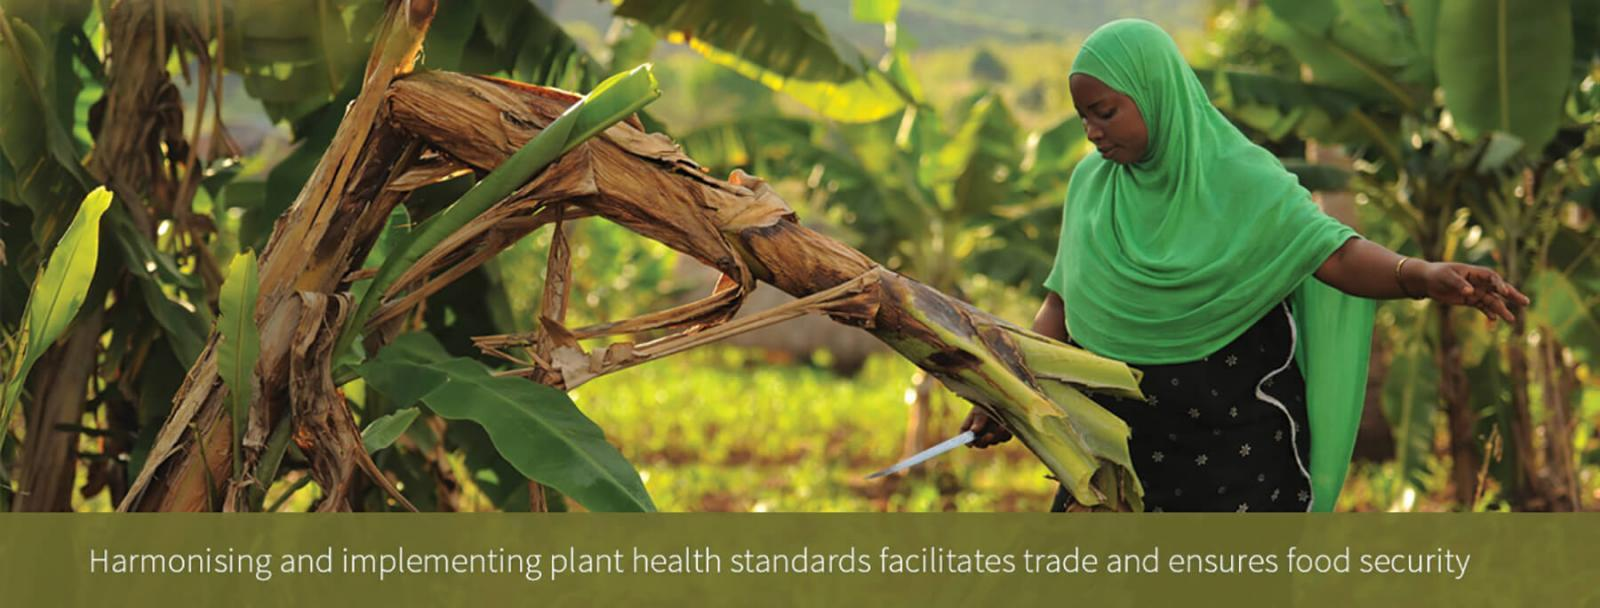 UN Names 2020 International Year of Plant Health